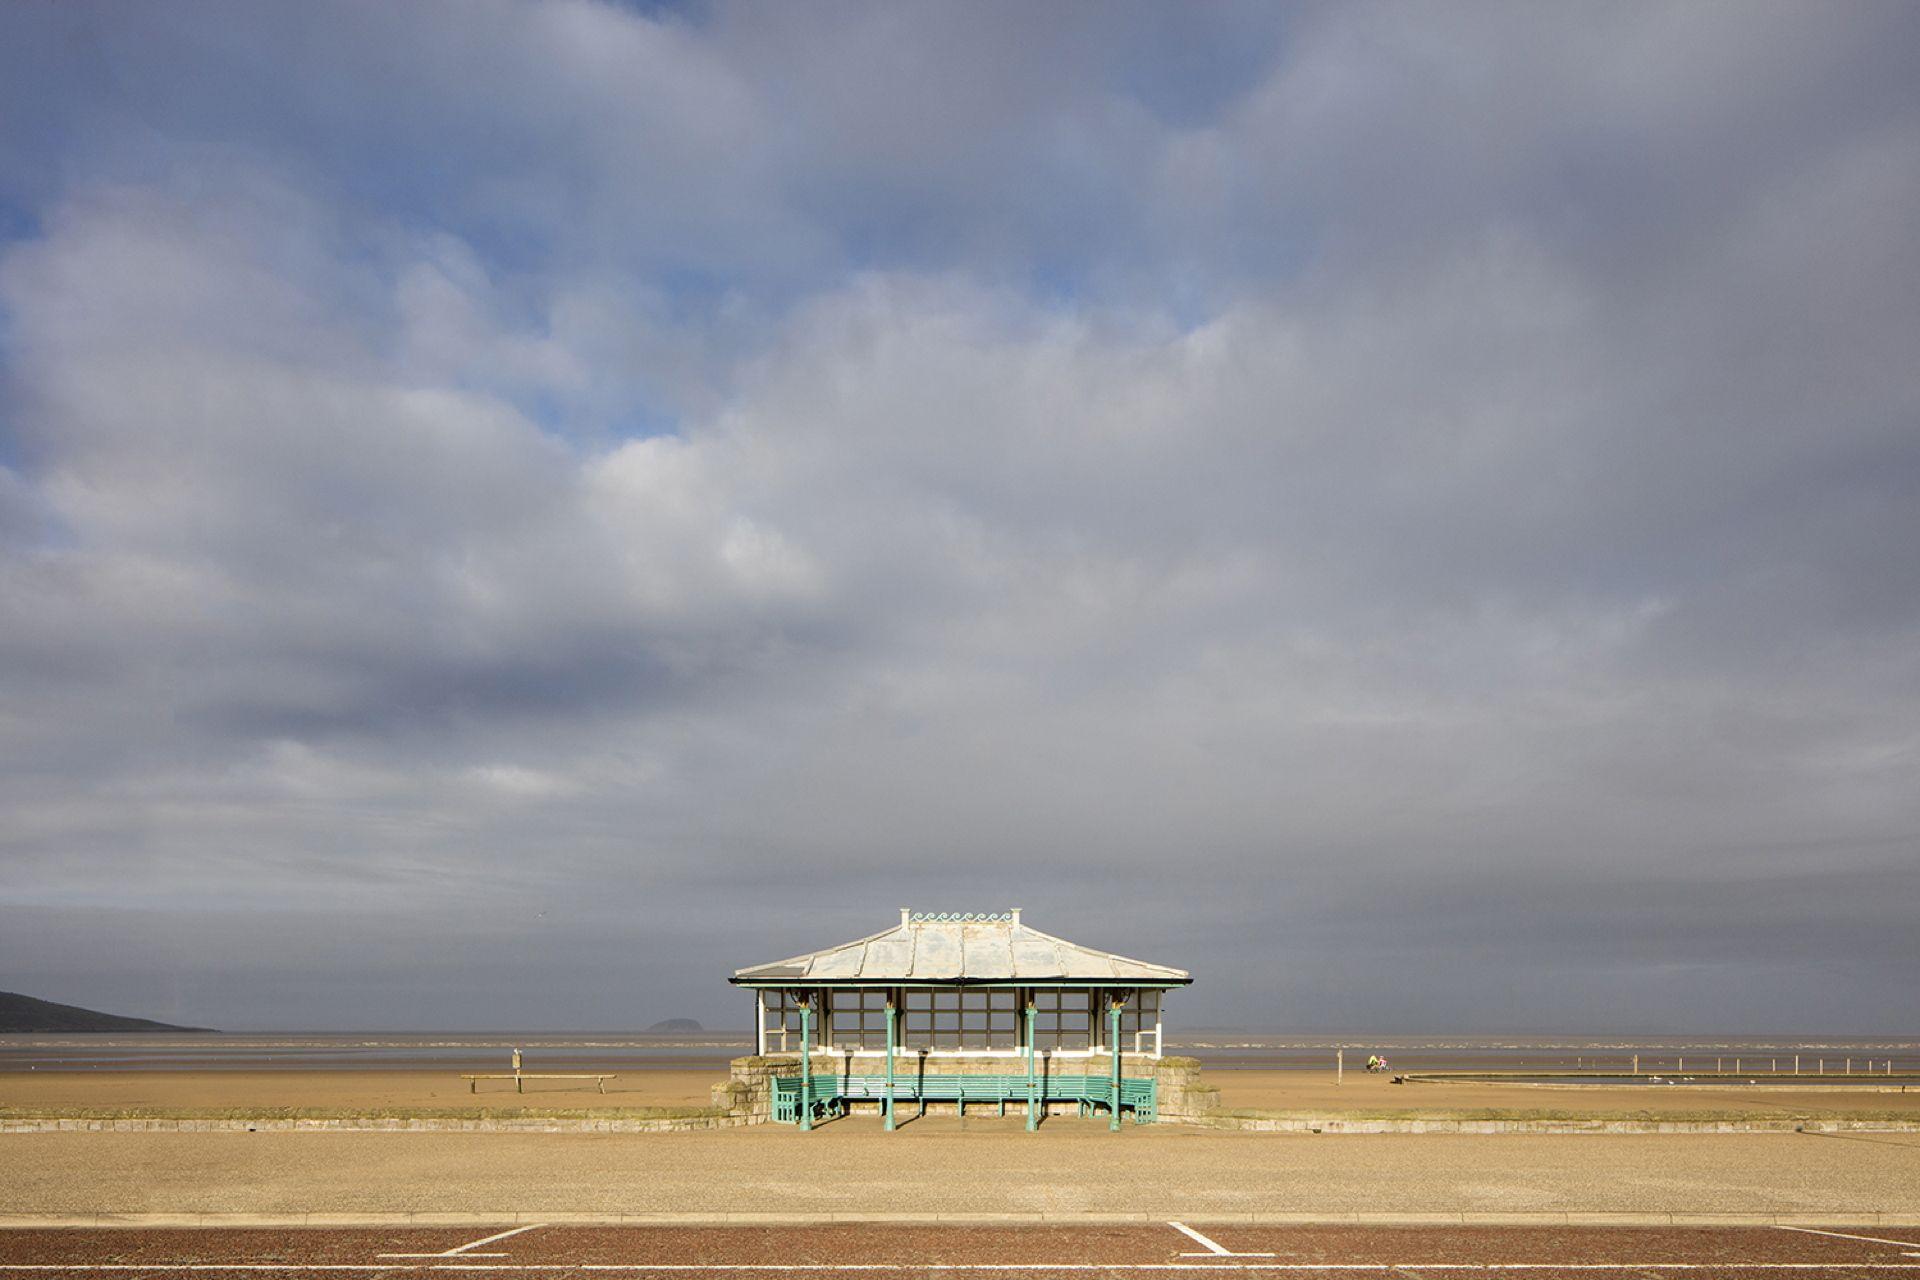 Will Scott. Seaside Shelters.